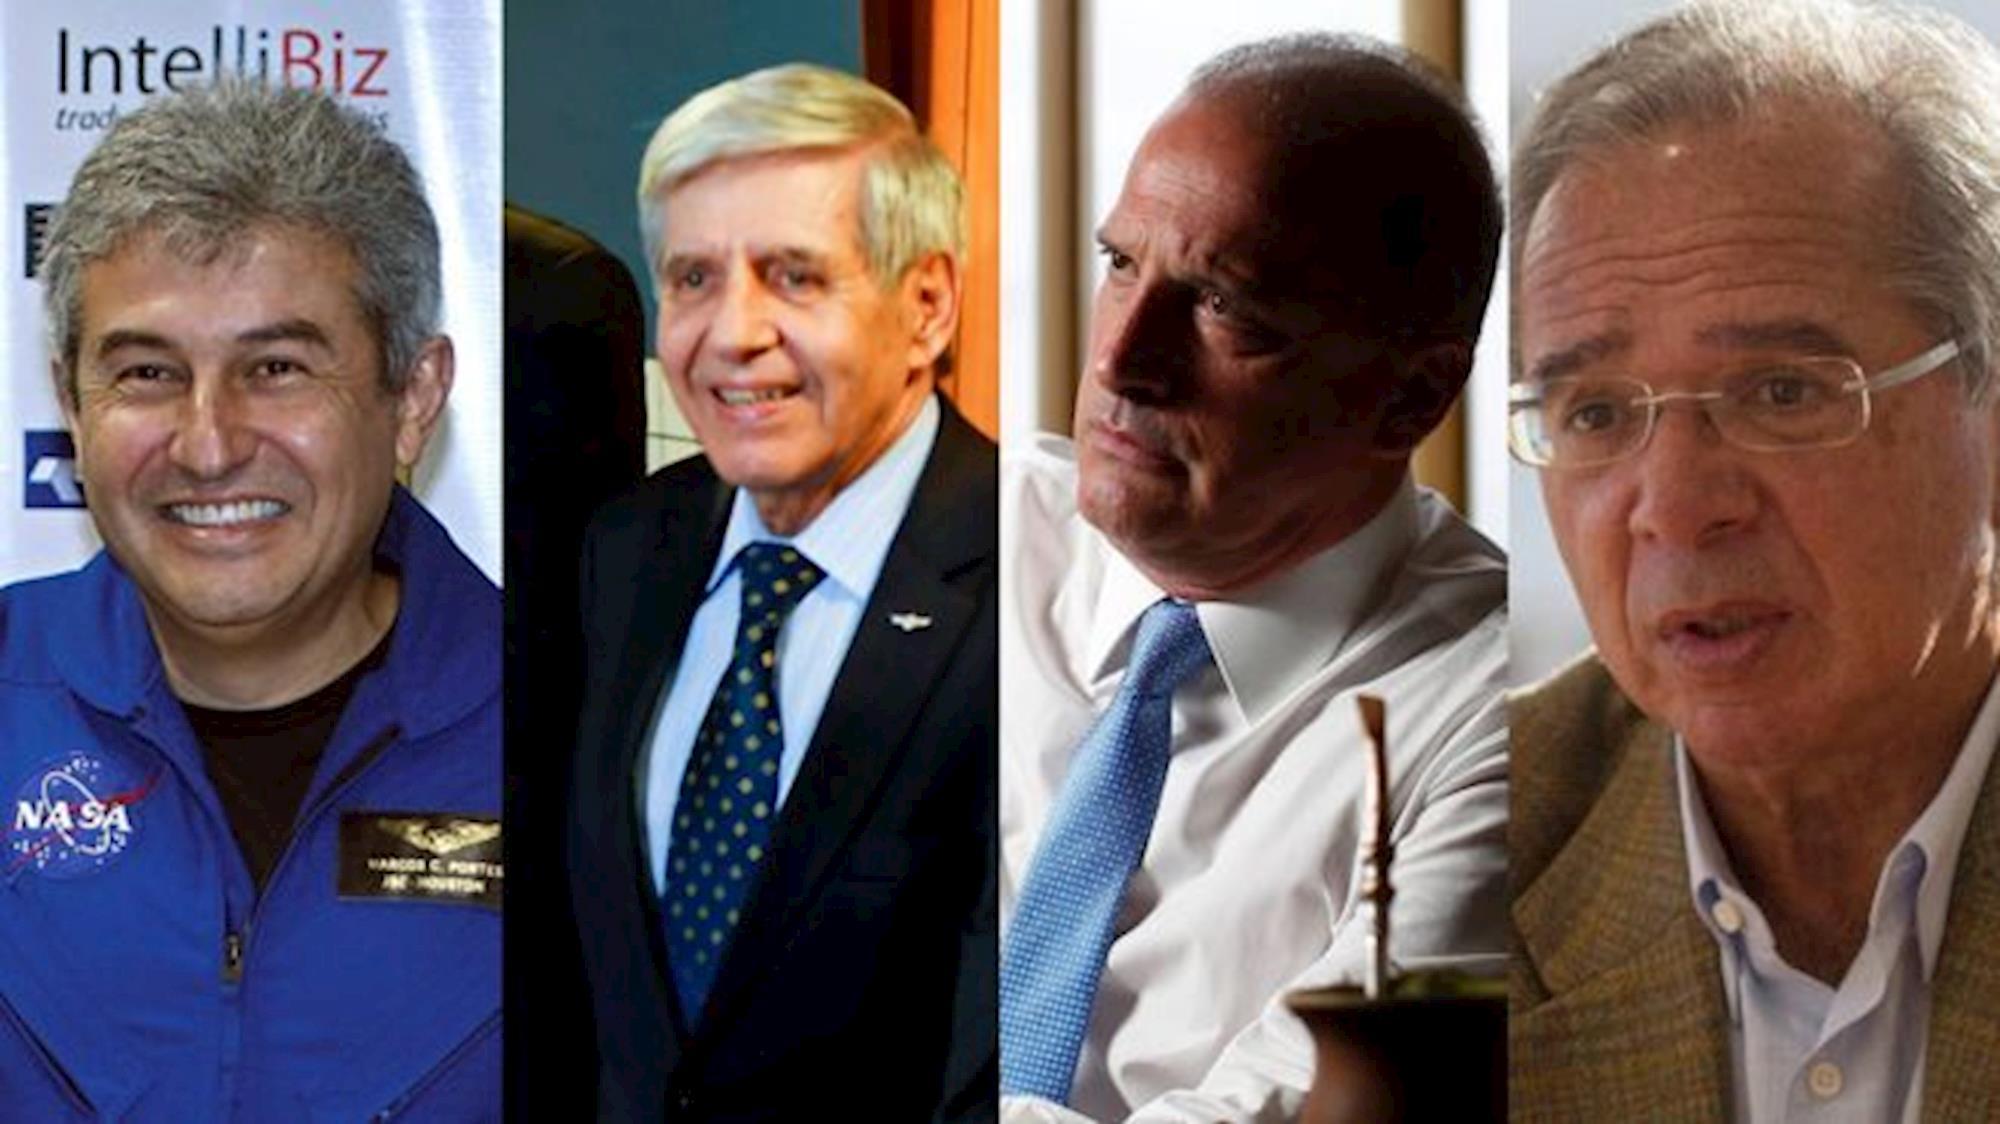 ministro, governo, bolsonaro,, AFP/GETTY